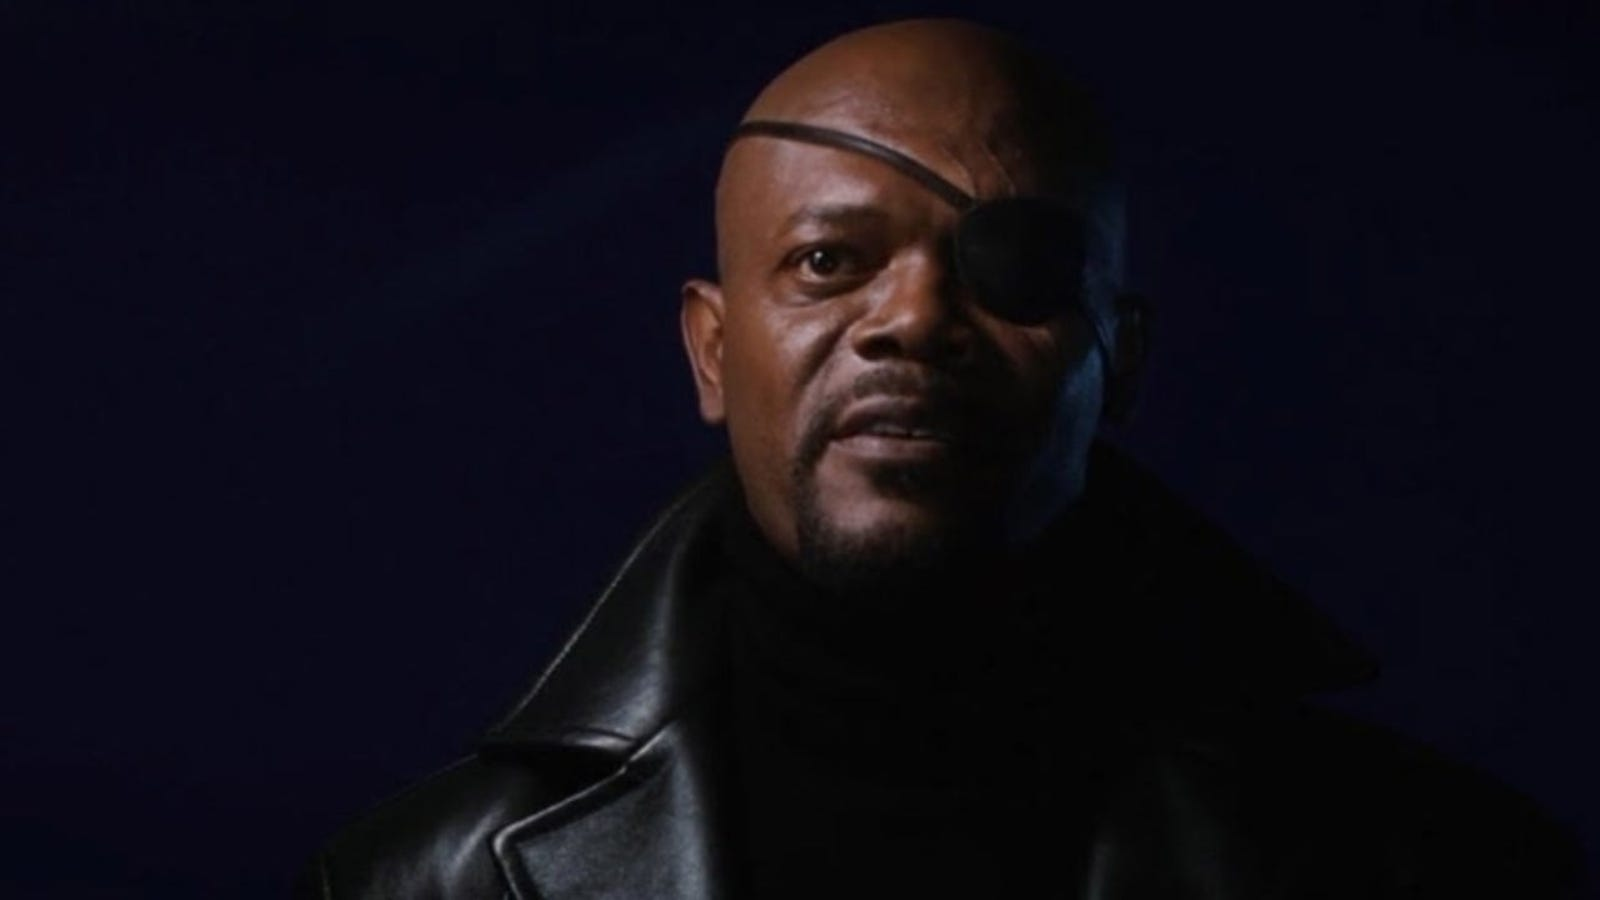 Iron Man Had an Alternate Post-Credits Scene Where Nick Fury Referenced the X-Men